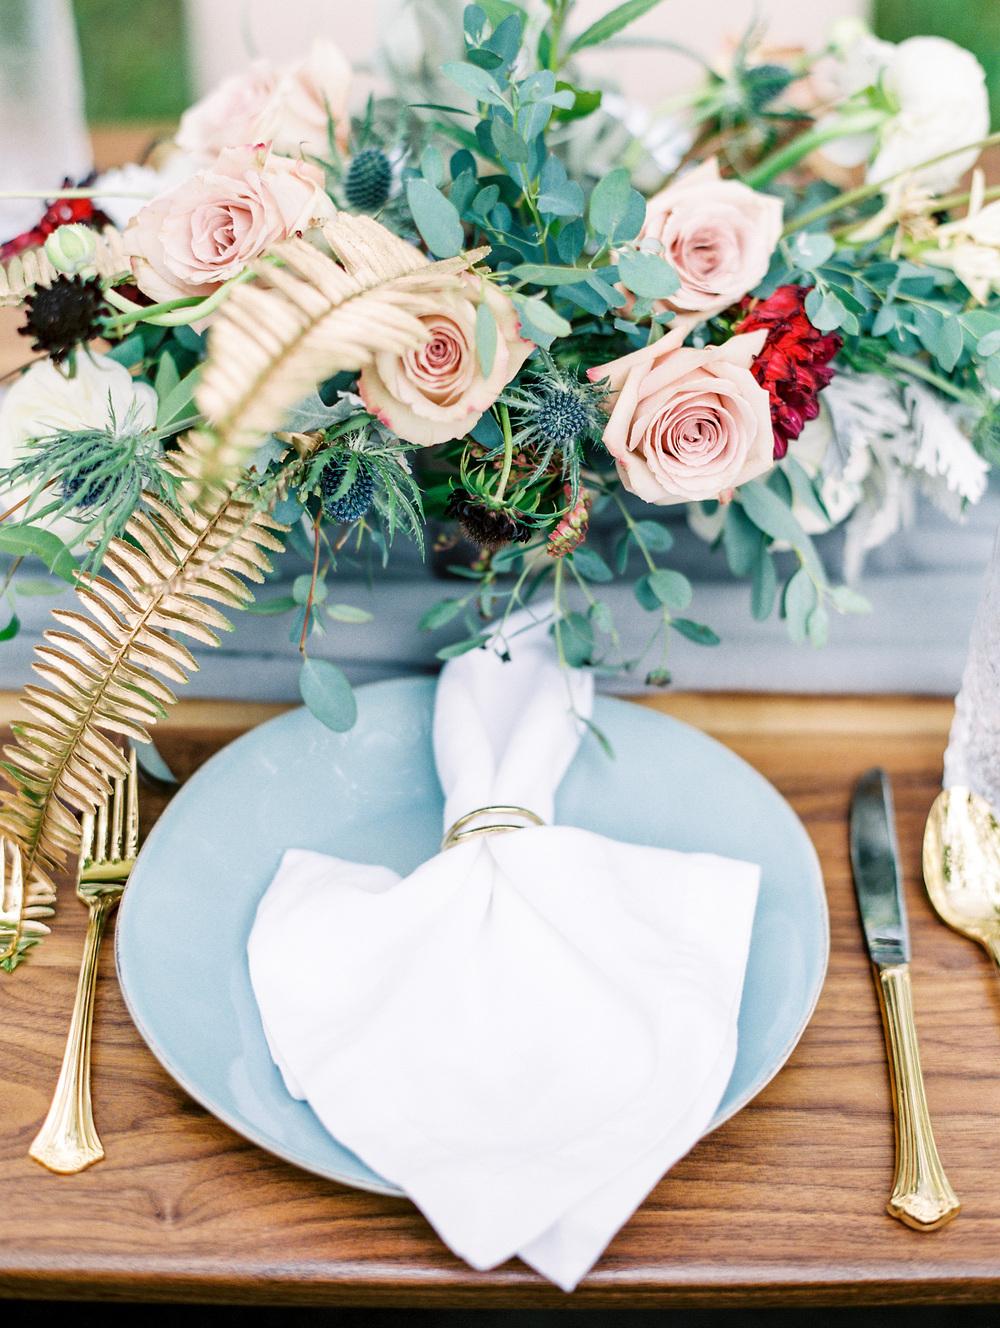 Dana-Fernandez-Photography-Houston-Wedding-Photographer-Film-100-Layer-Cake-Wedding-Inspiration-Destination-8.jpg